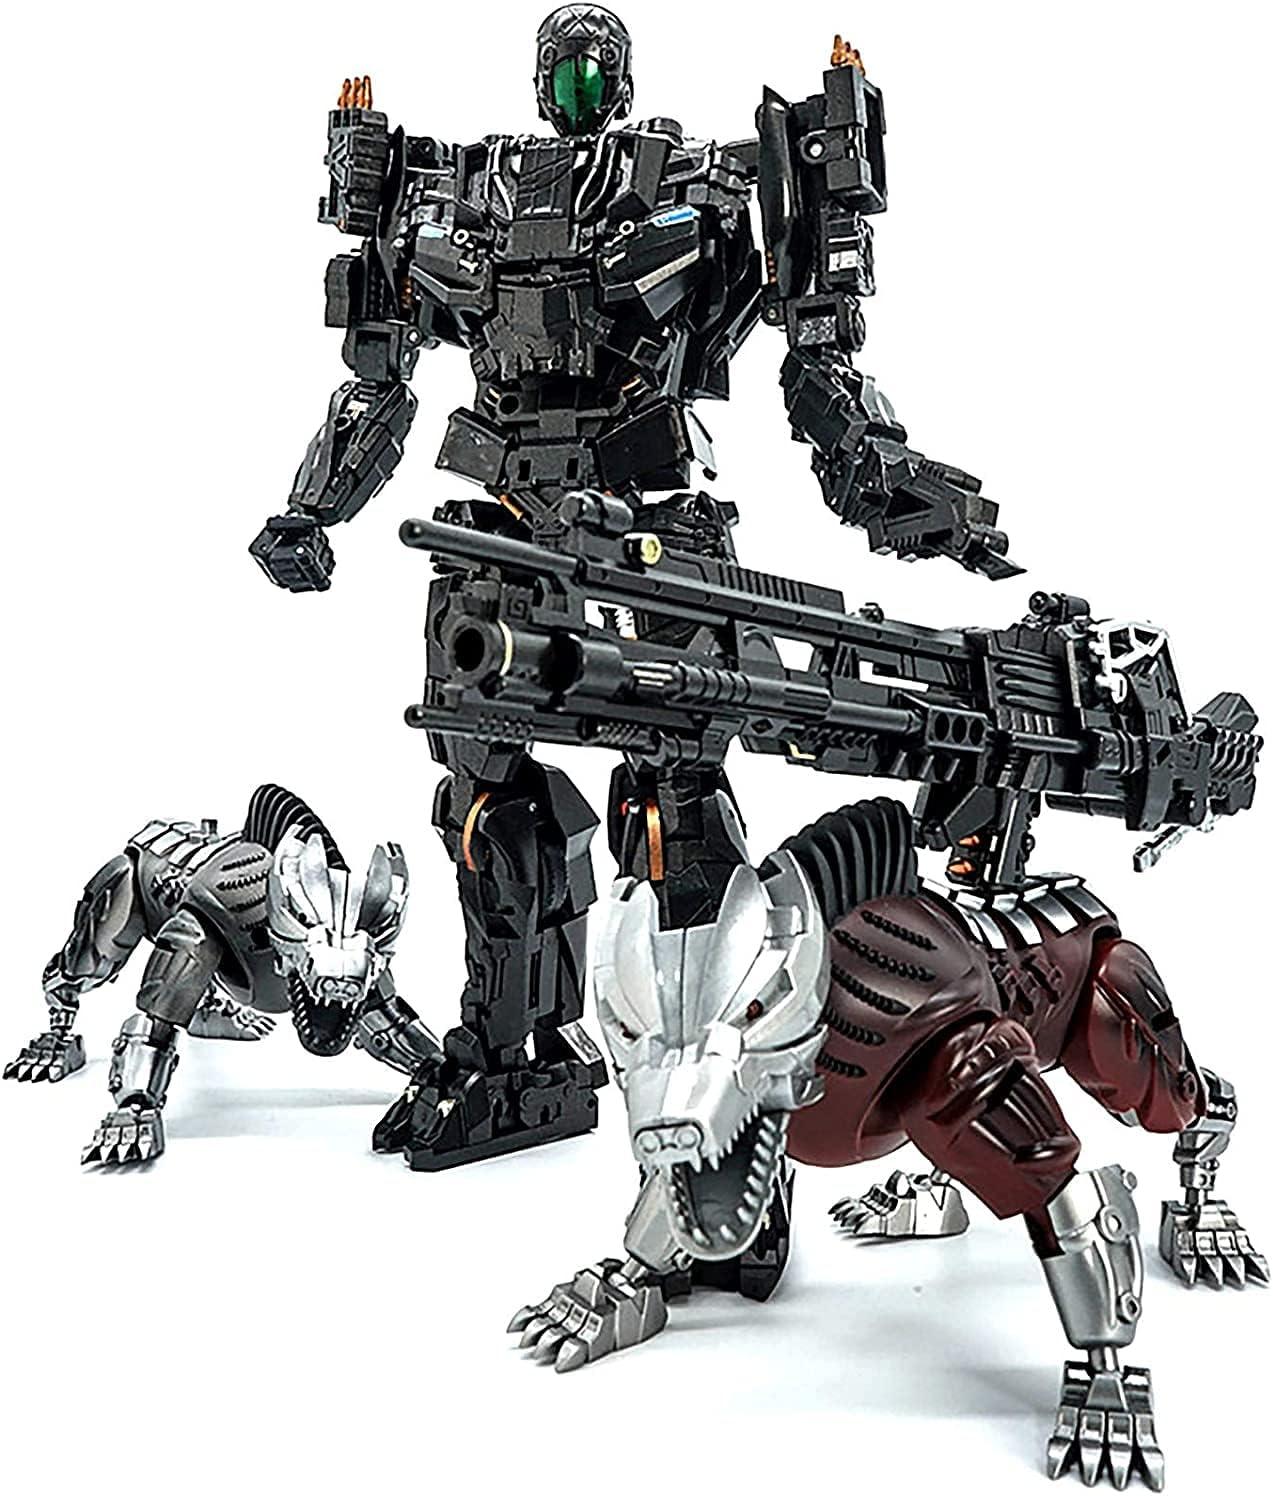 RSVPhandcrafted Transformer Toys Studio Regular dealer Series 11 M Popular popular Deluxe Class